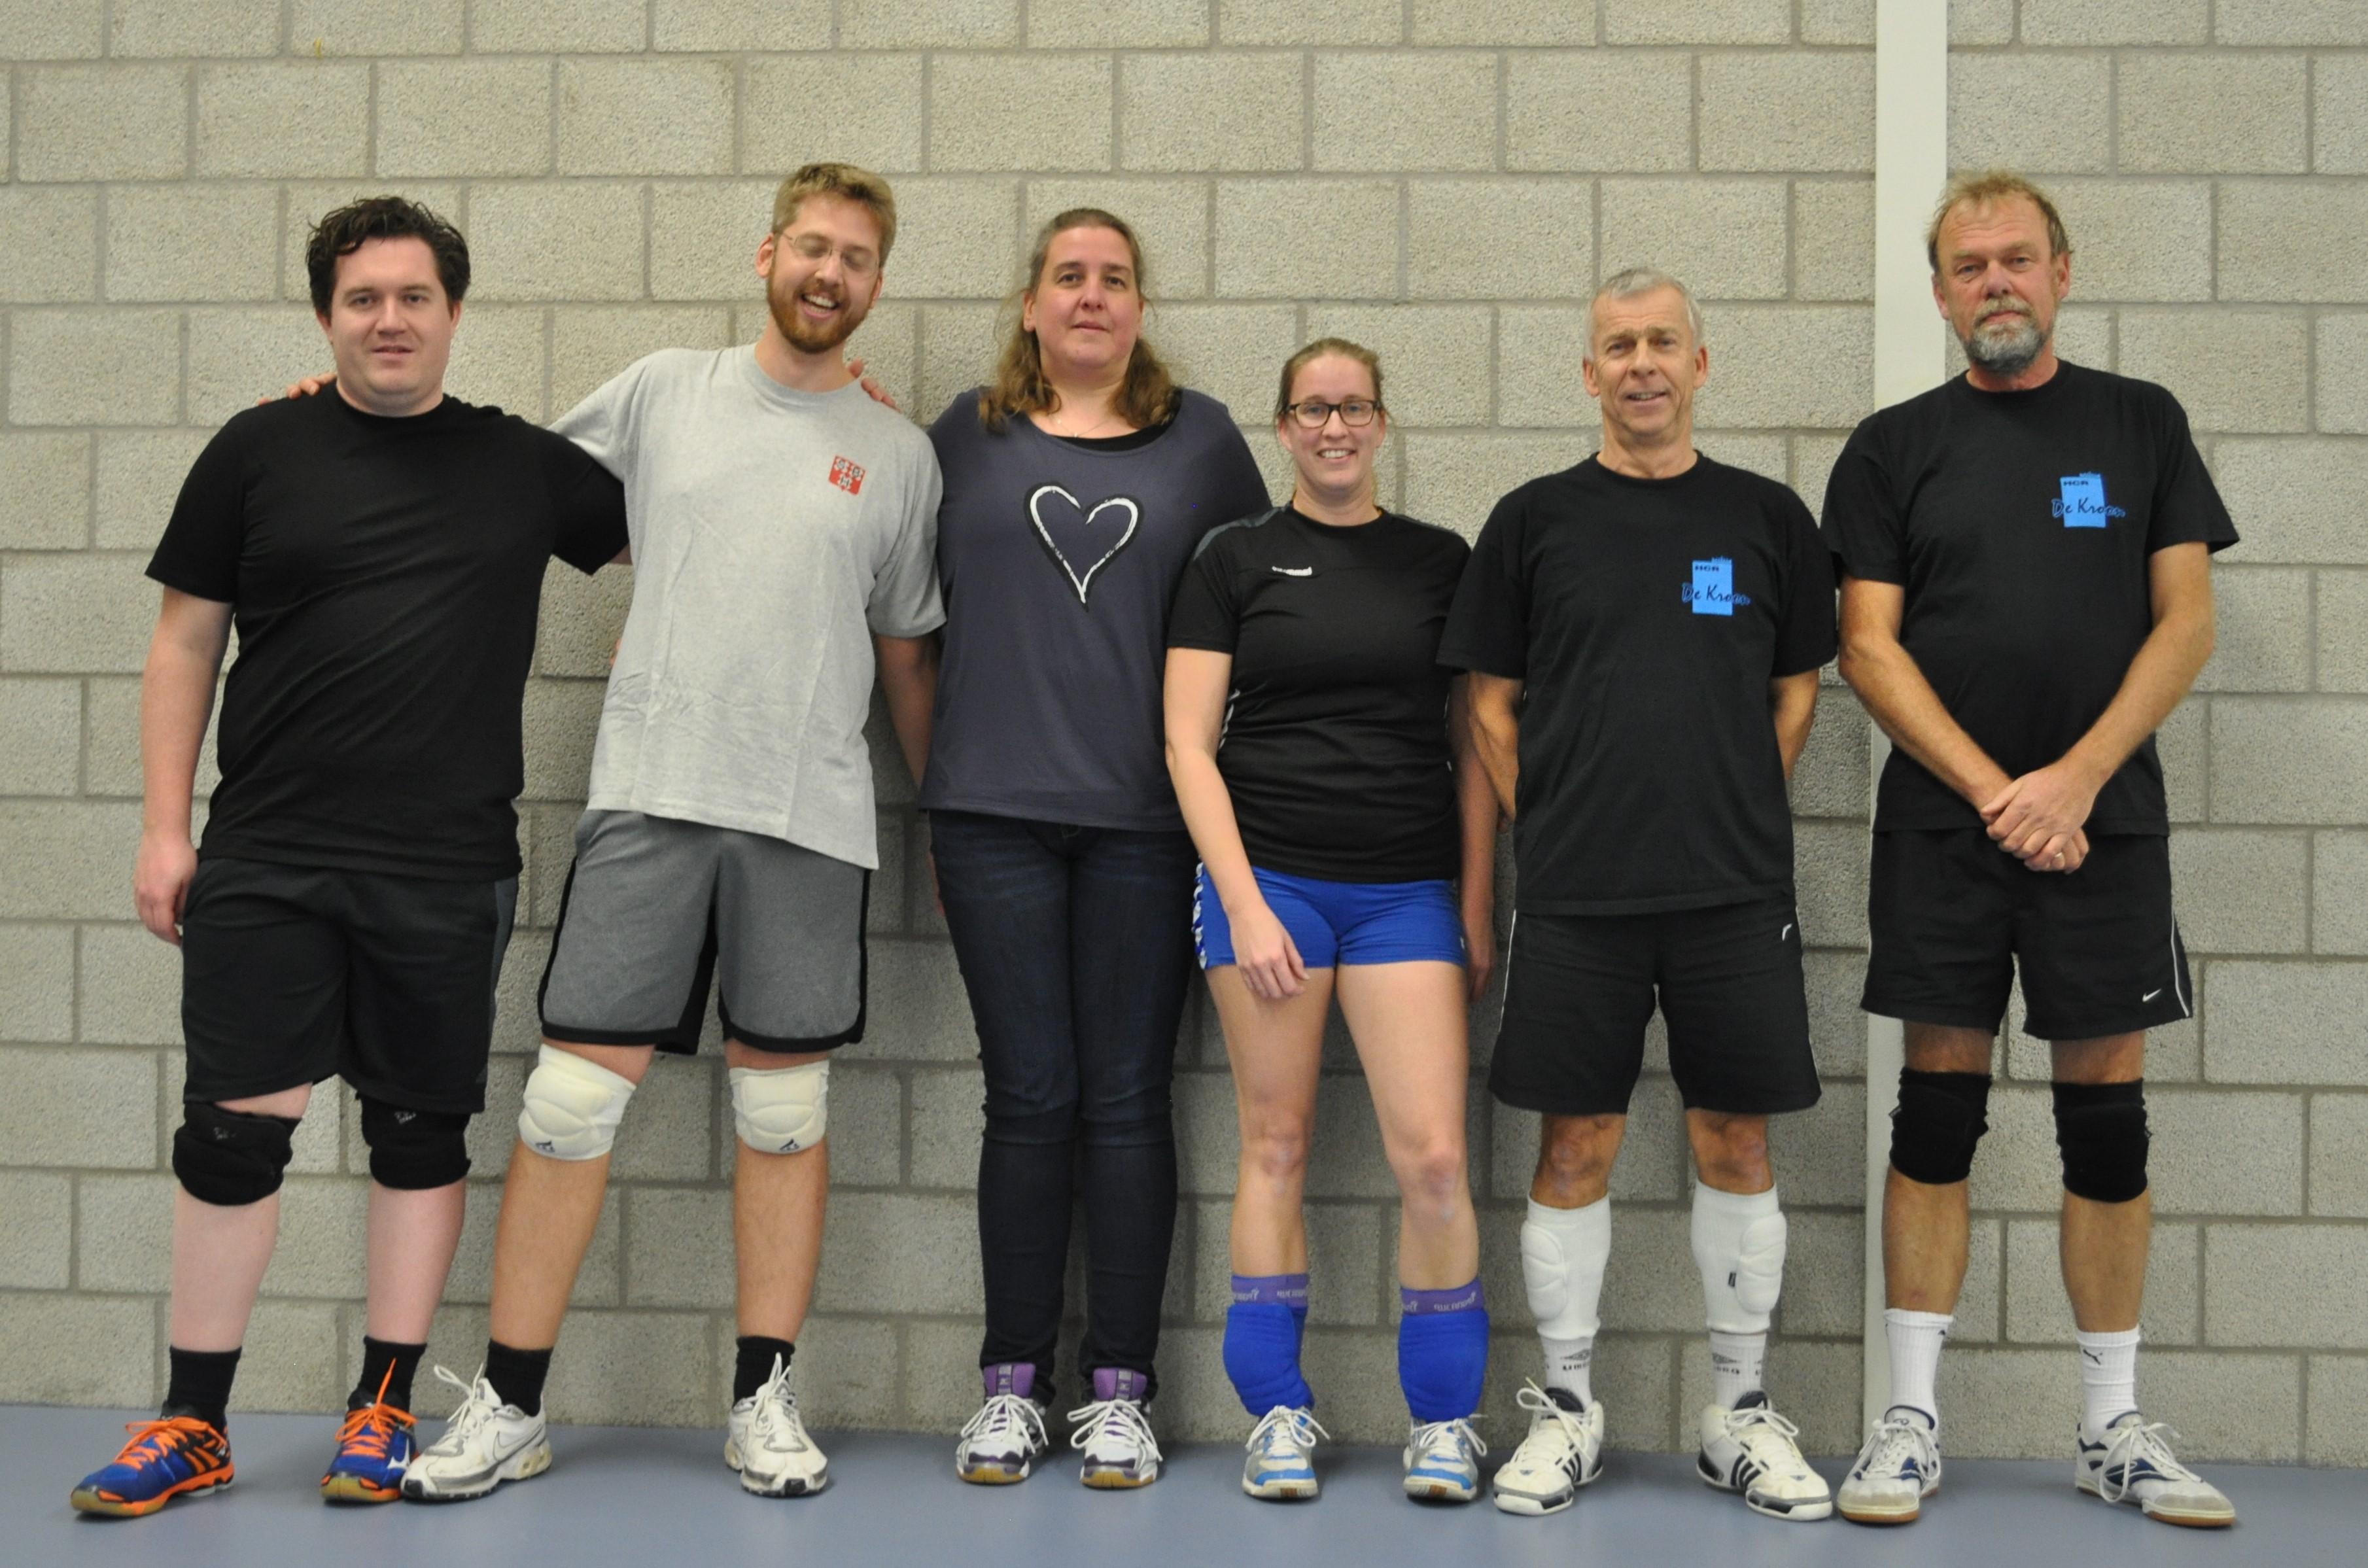 VV Wiska forza volleybal